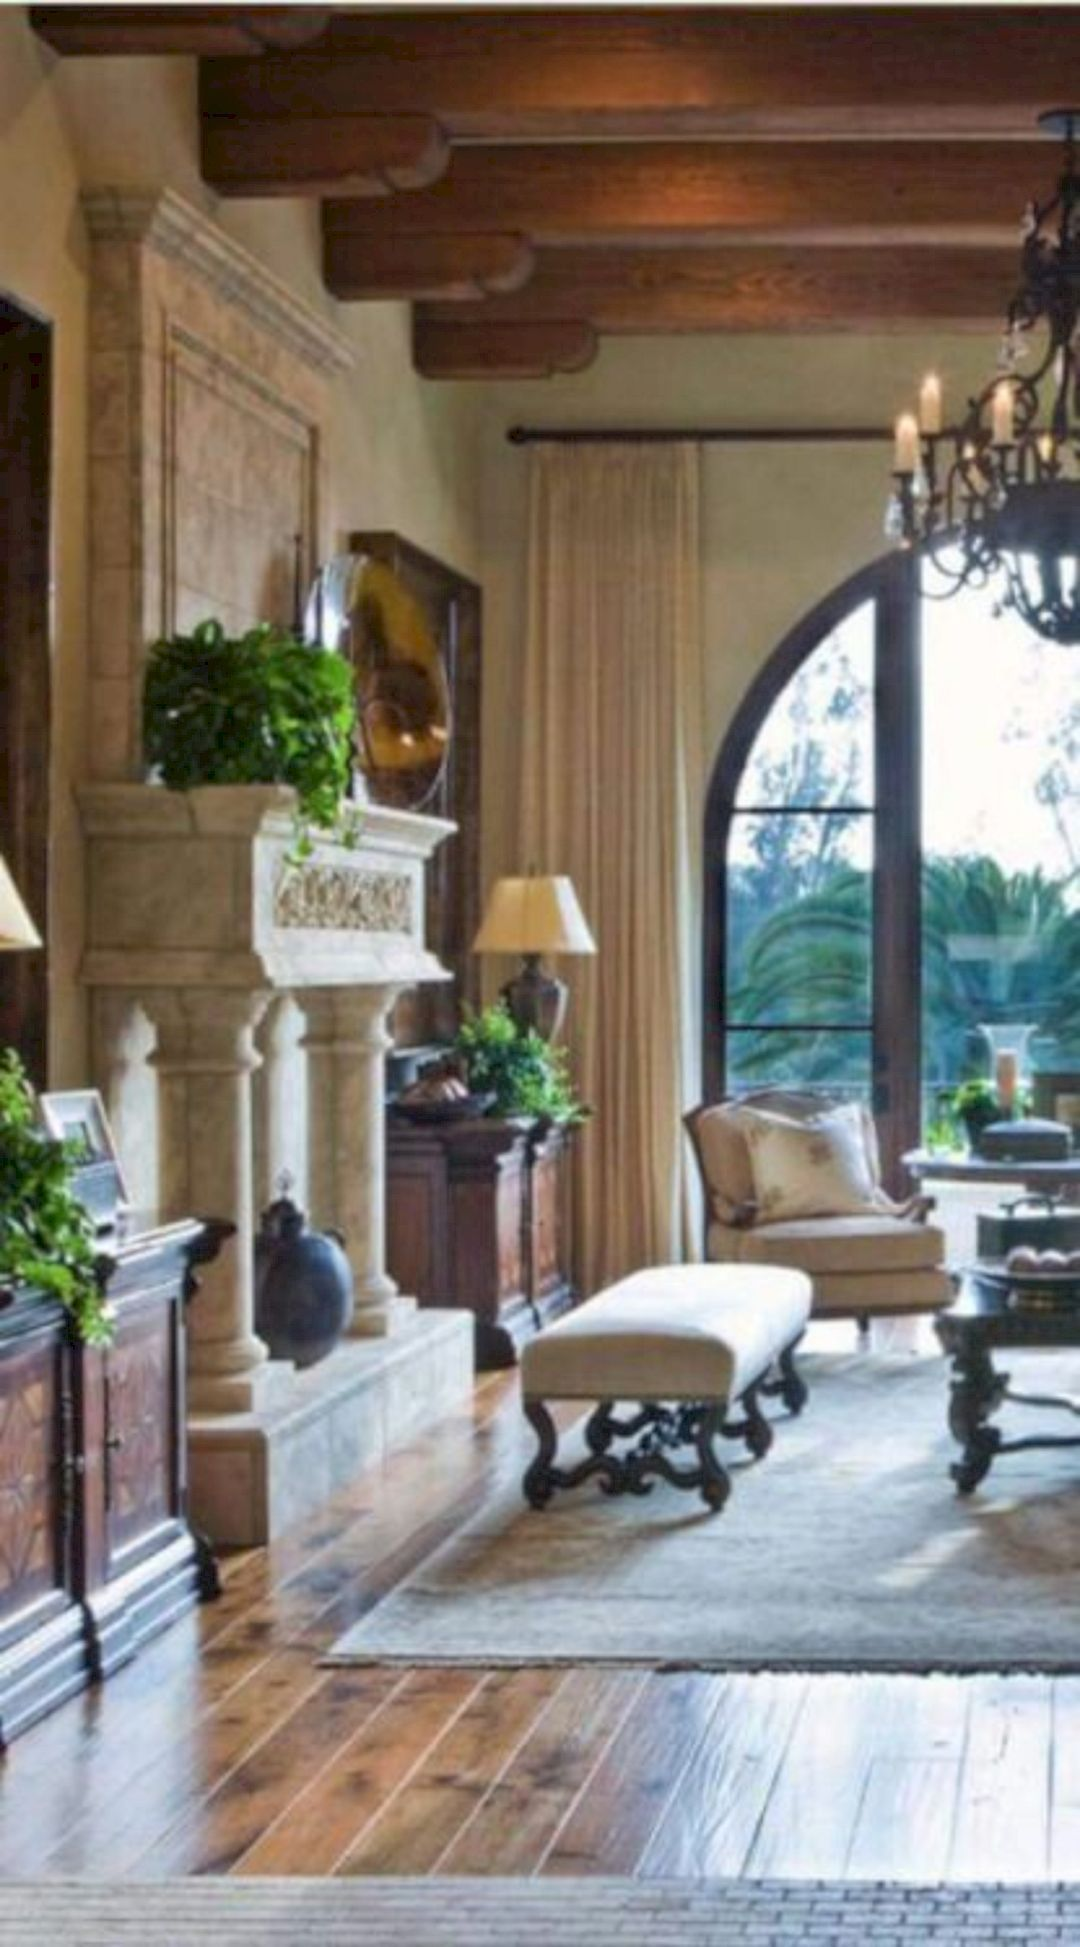 16 classic old world interior design ideas mediterranean on home interior design ideas id=36737